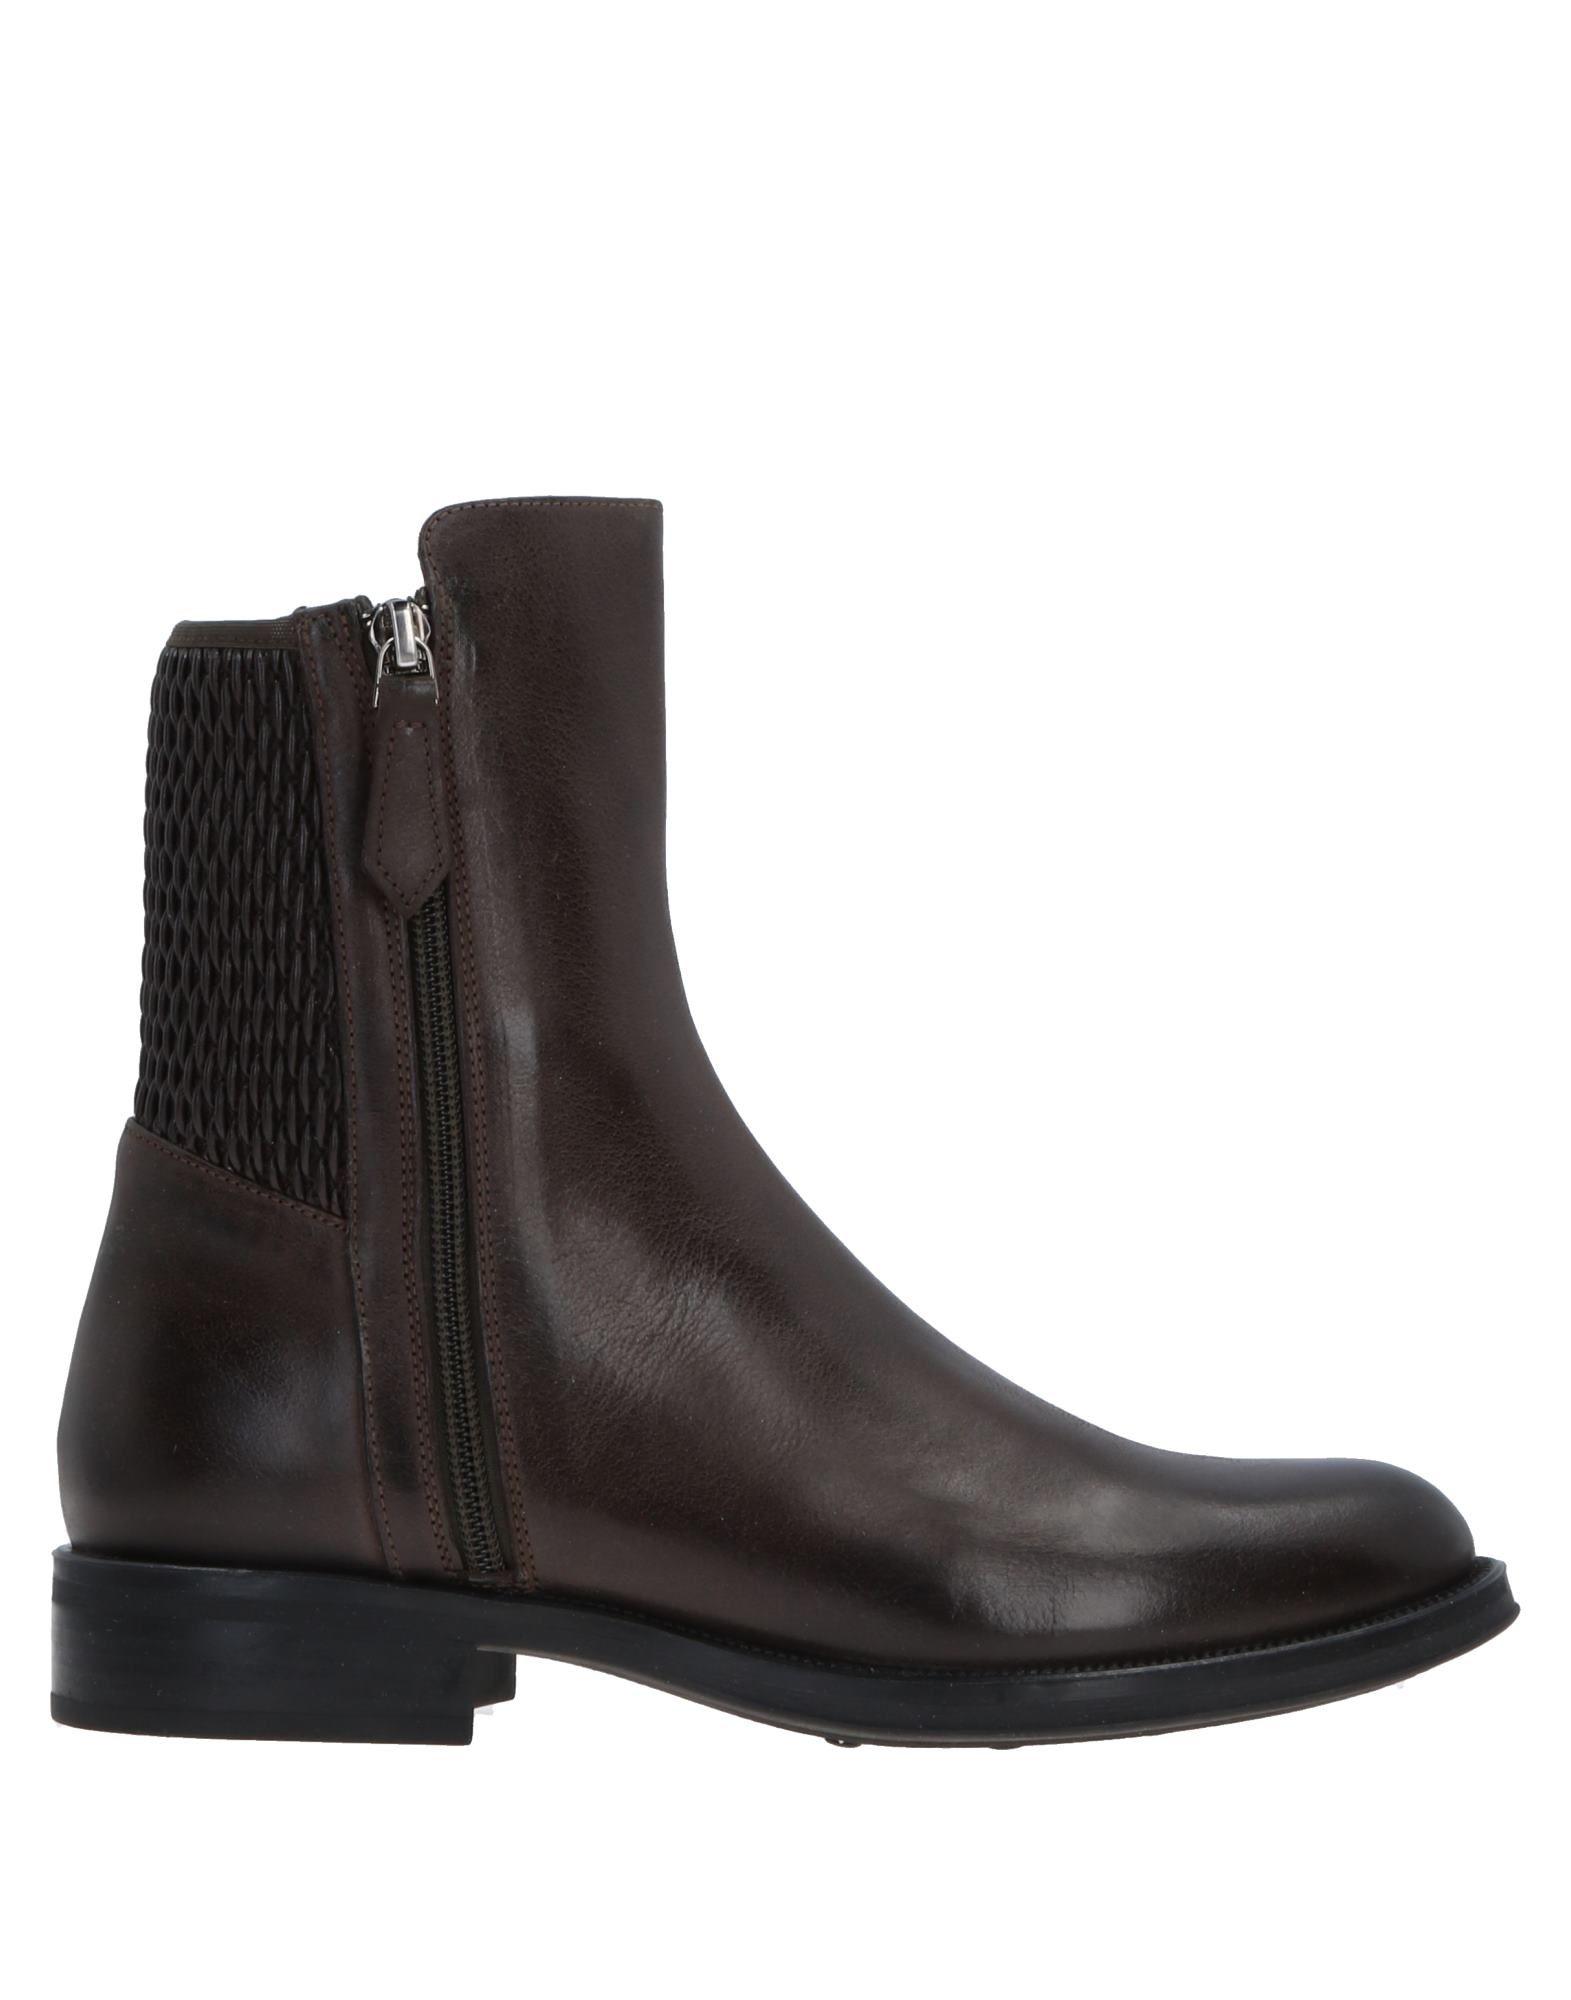 Rabatt Schuhe F.Lli Bruglia Stiefelette Damen  11518489LW